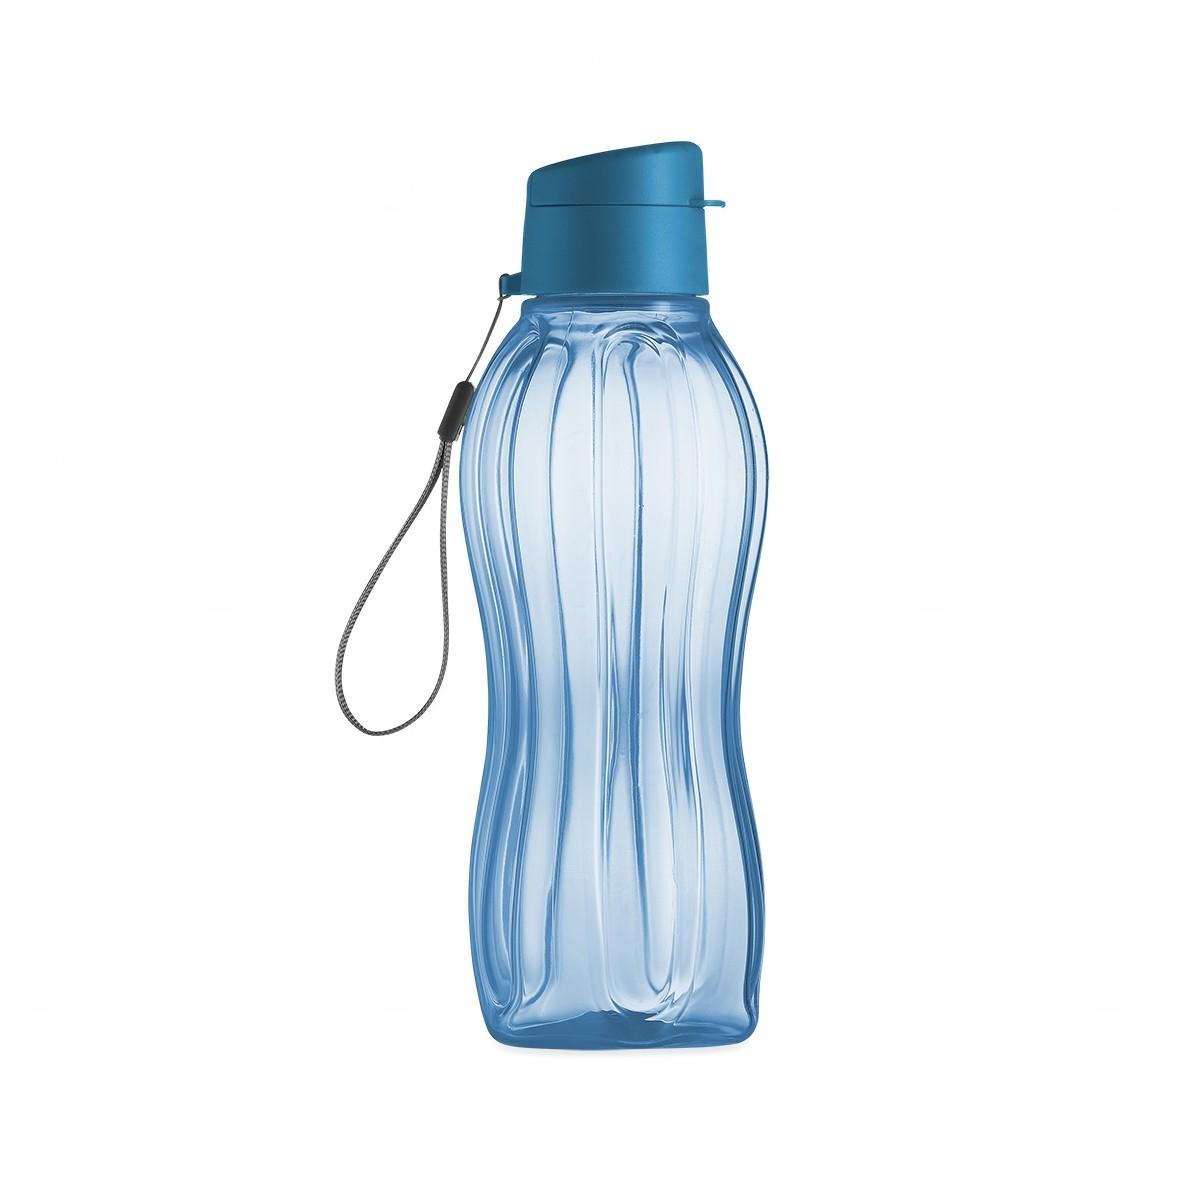 Garrafa Personalizado Cola - 800 ml Azul